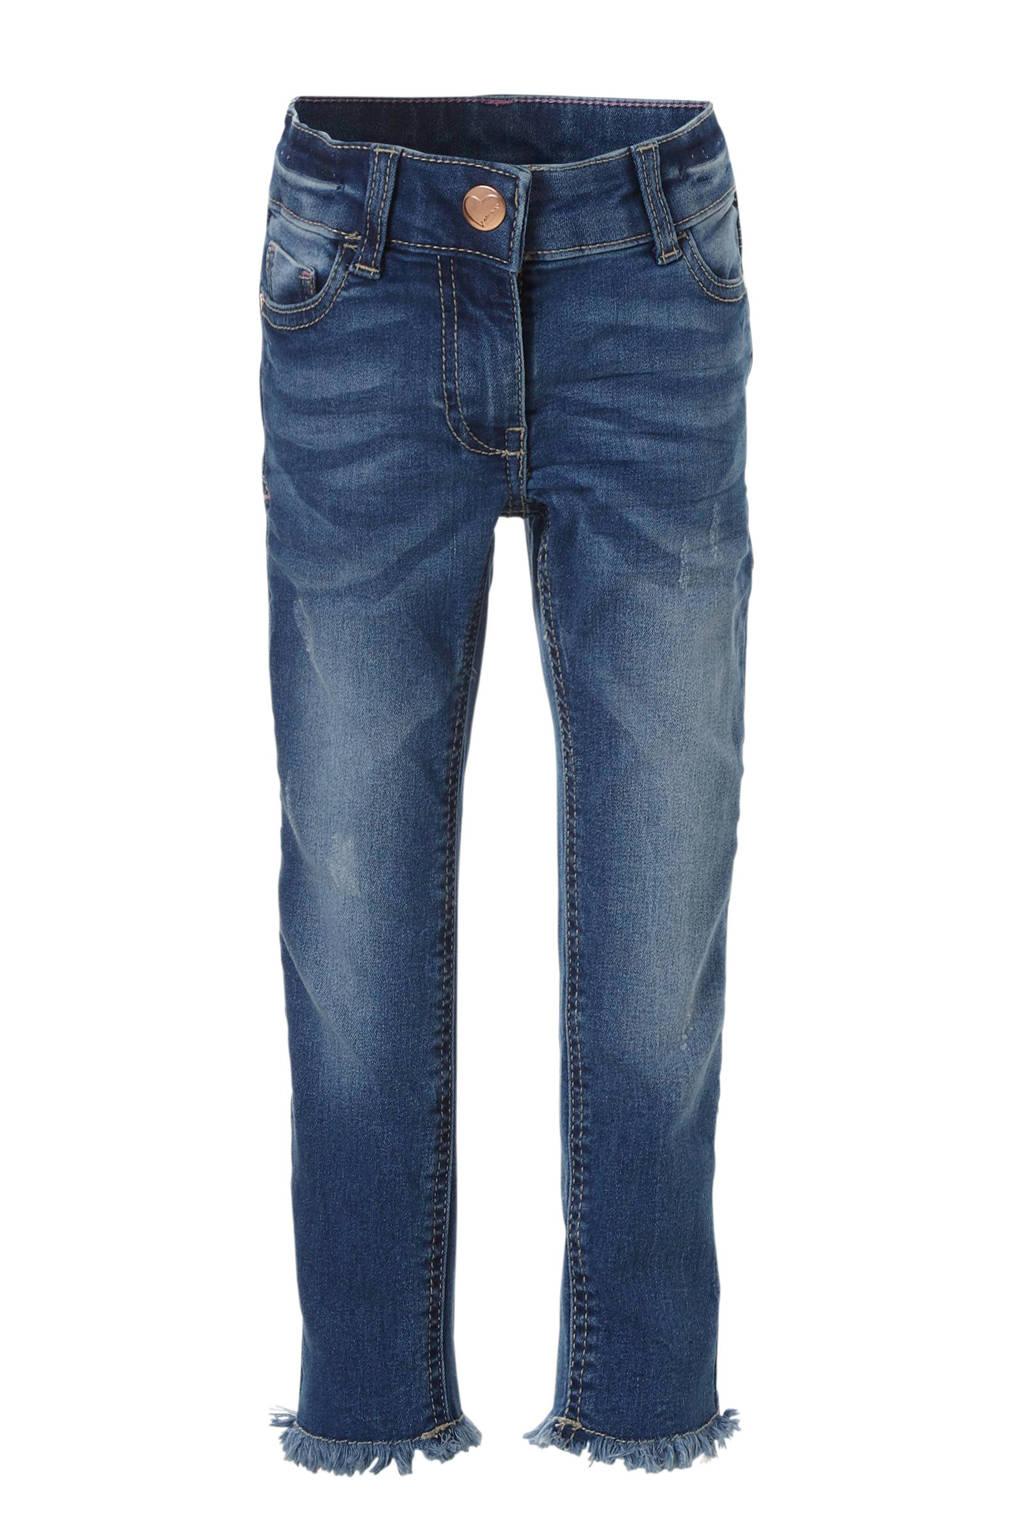 C&A Palomino super skinny jeans, Stonewashed